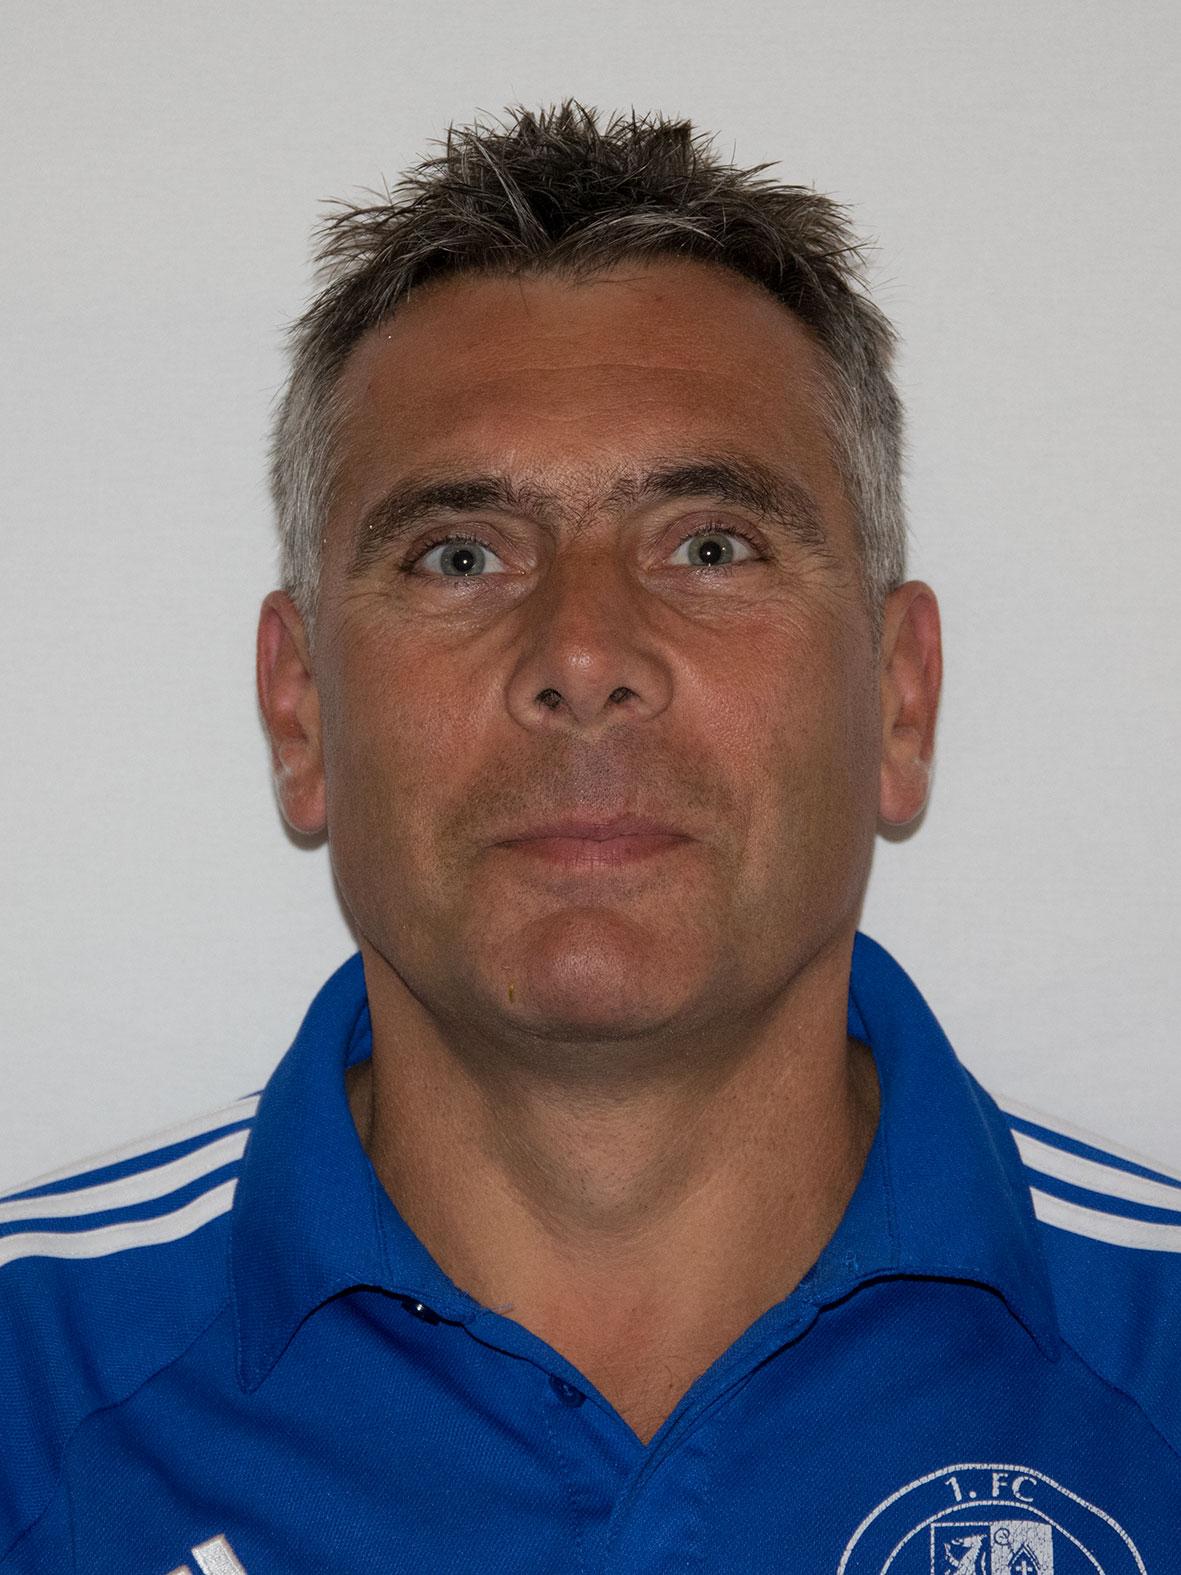 Ignaz Riegler